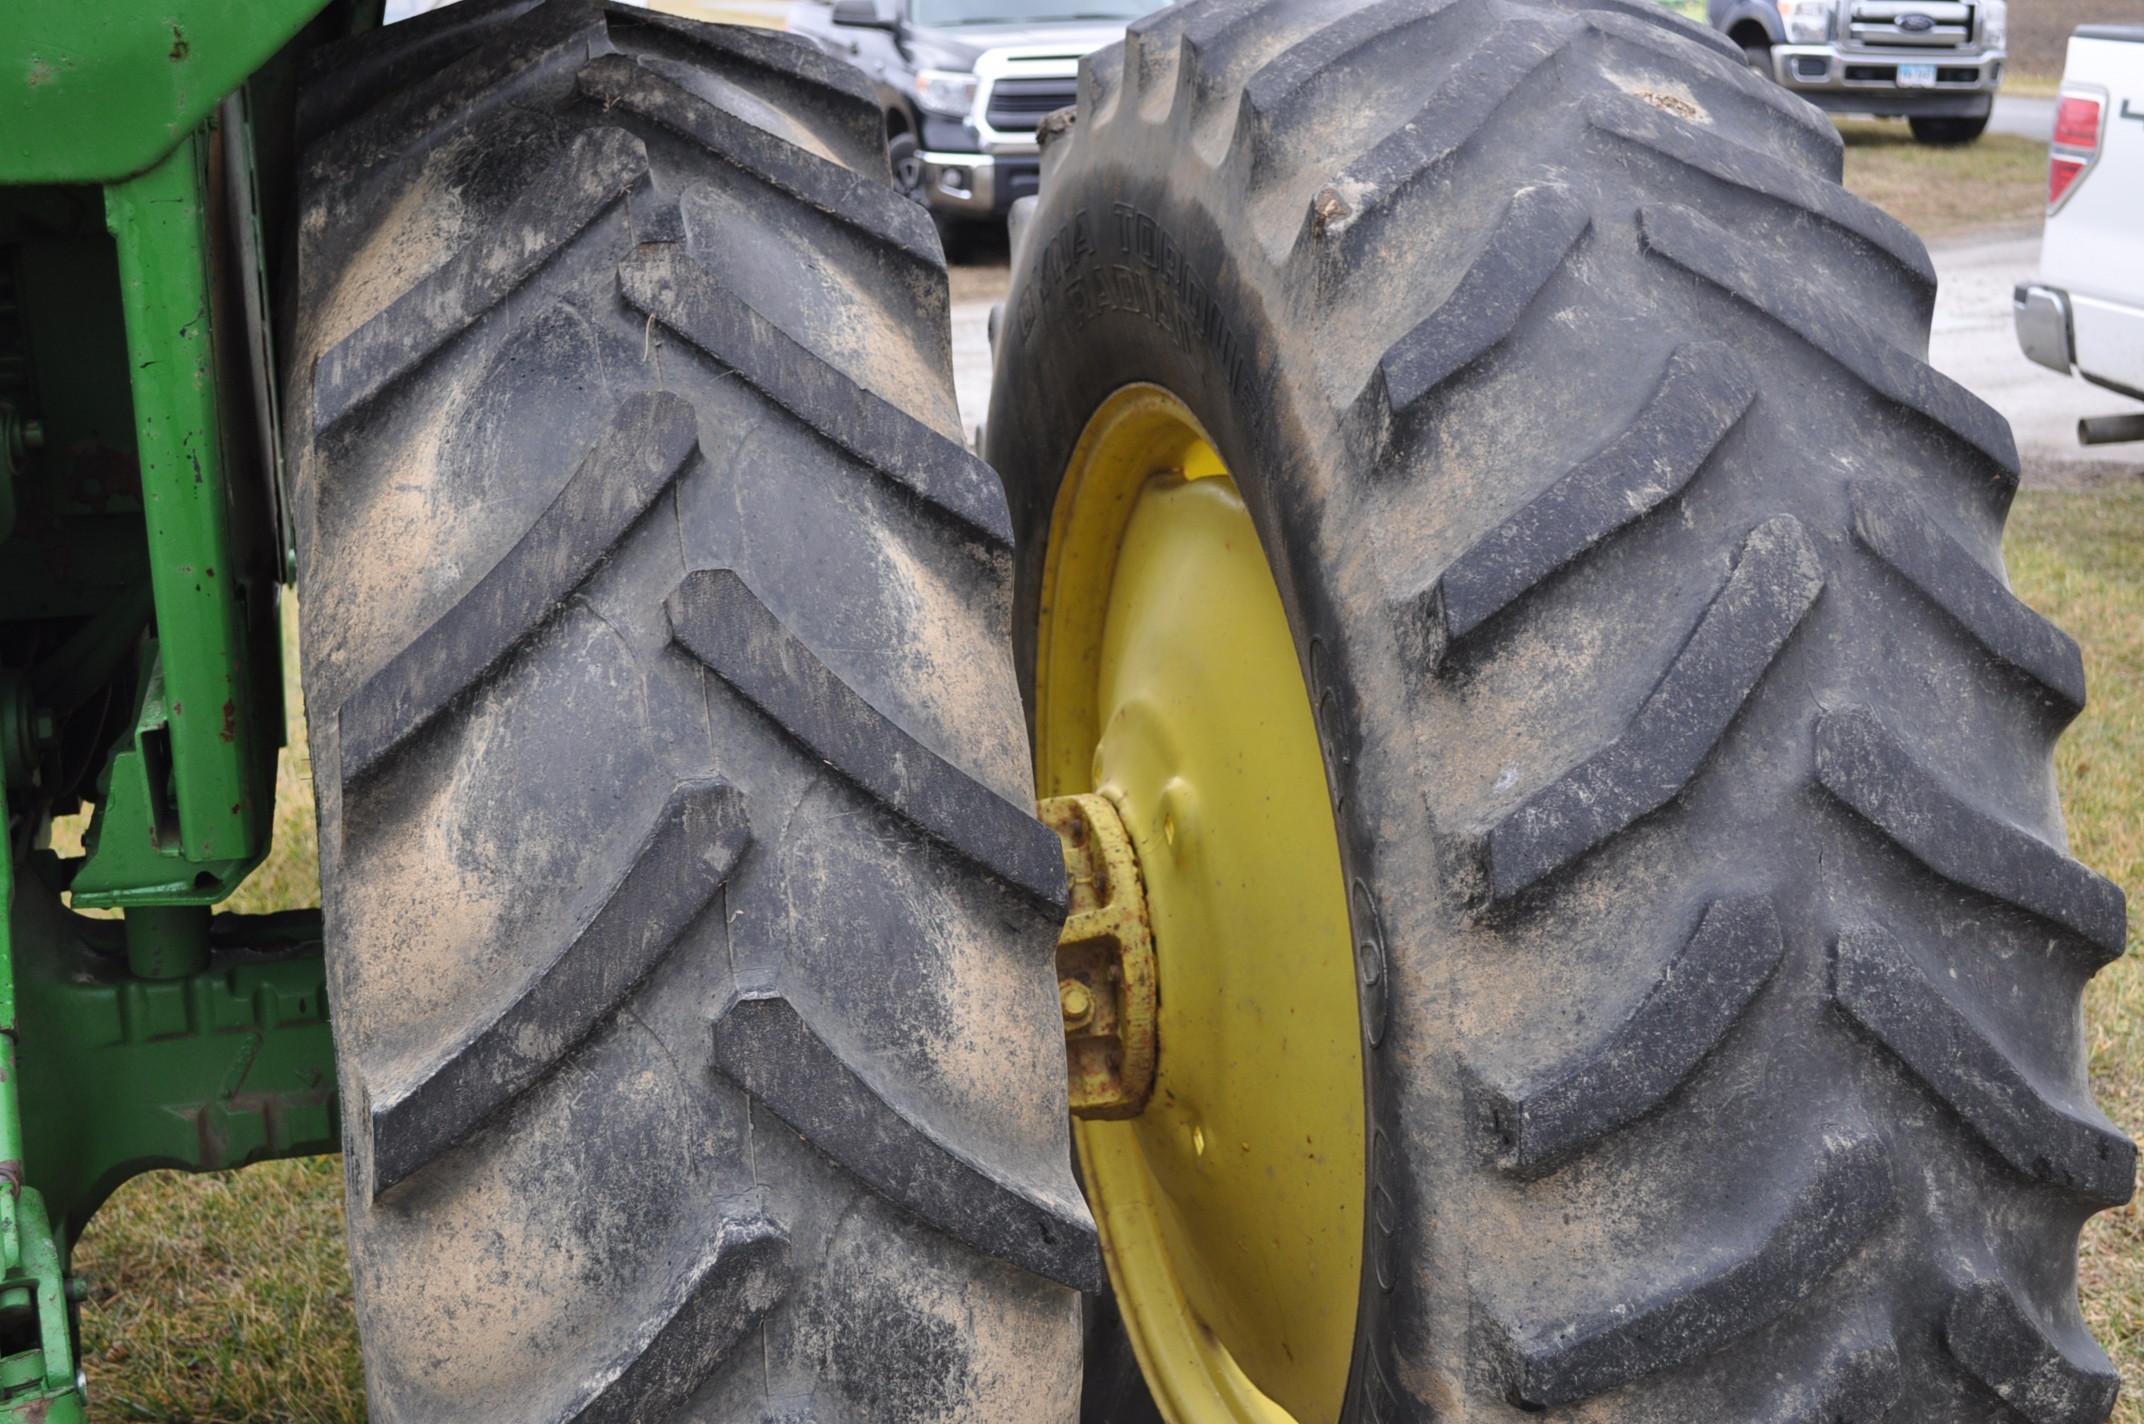 John Deere 4430 tractor, diesel, 18.4-34 hub duals, 10.00-16 front, CHA, Quad range, 2 hyd - Image 7 of 20